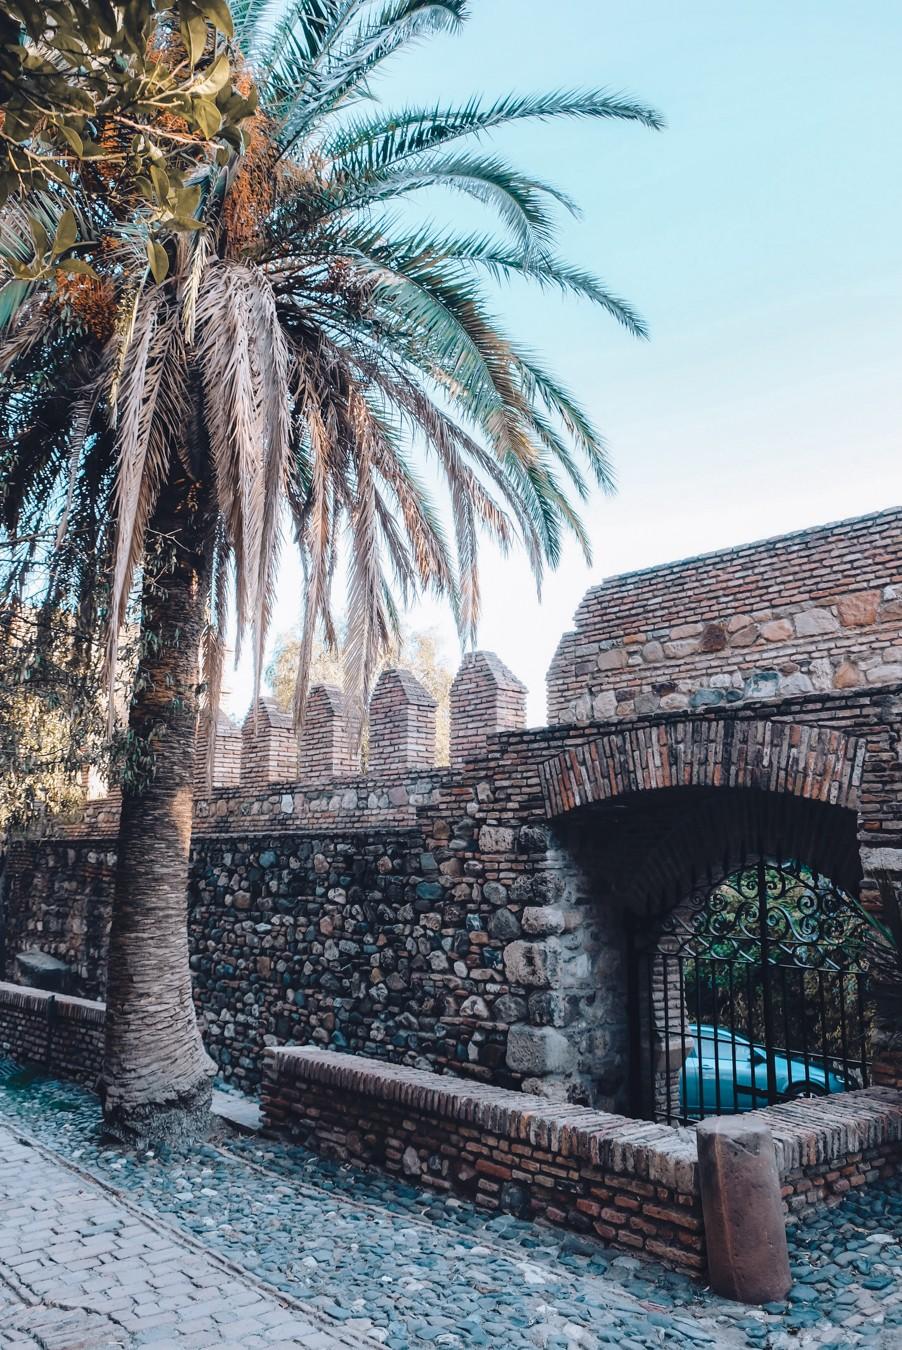 Inside of the Alcazaba fortress in Malaga, Spain.